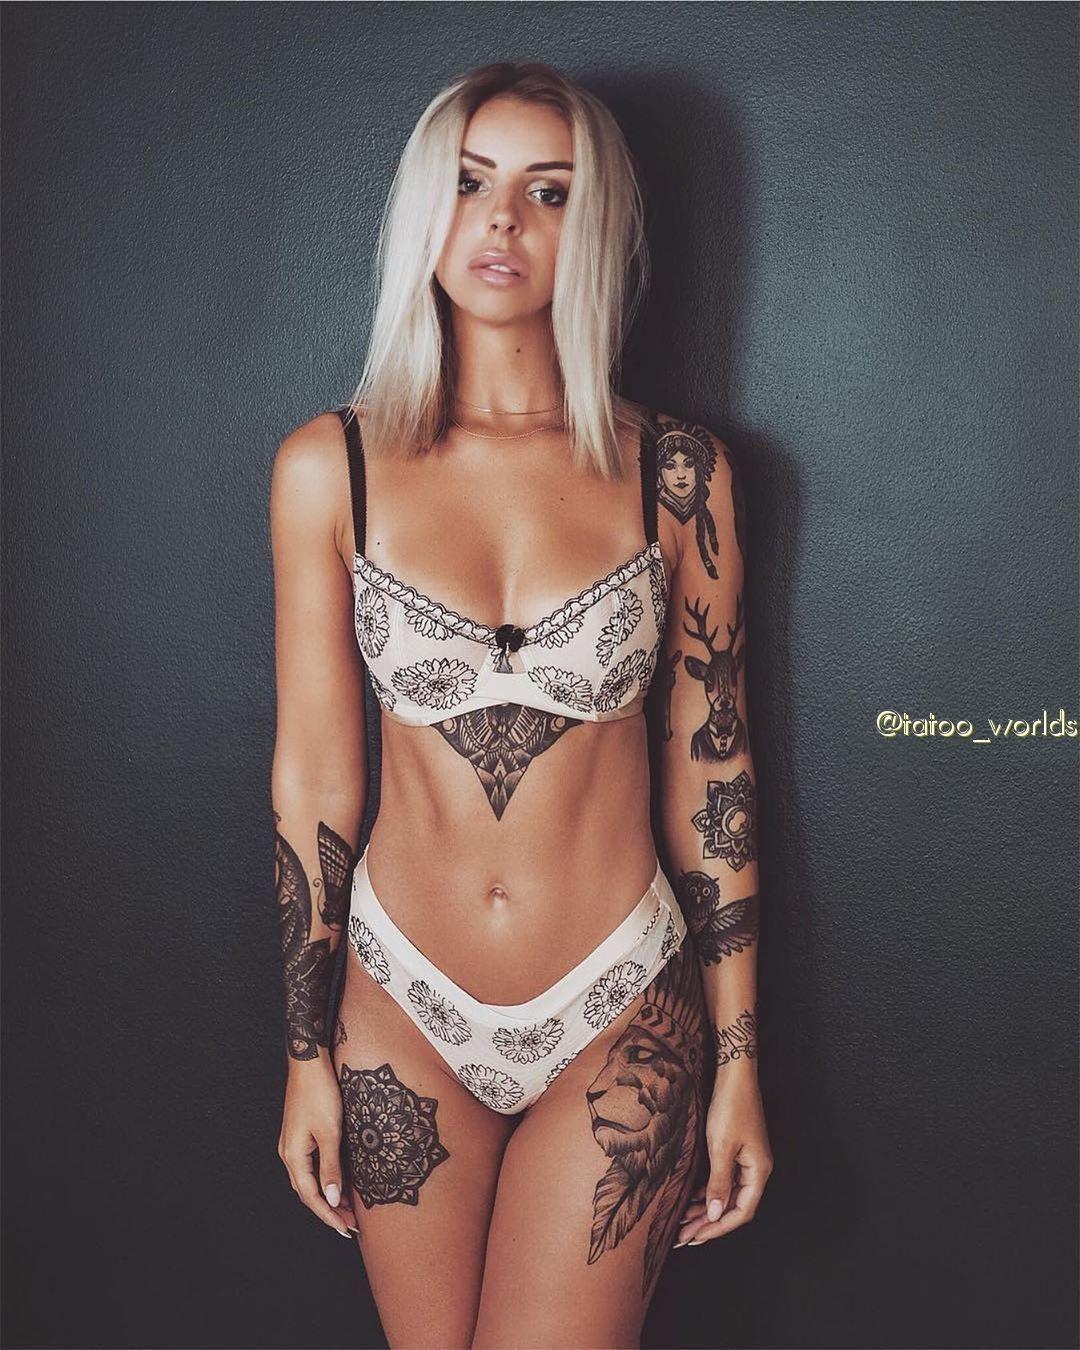 Photo of She loves me not,loves me not ? #alisha_hoult #tattoedgirl #tattooed #inked #…